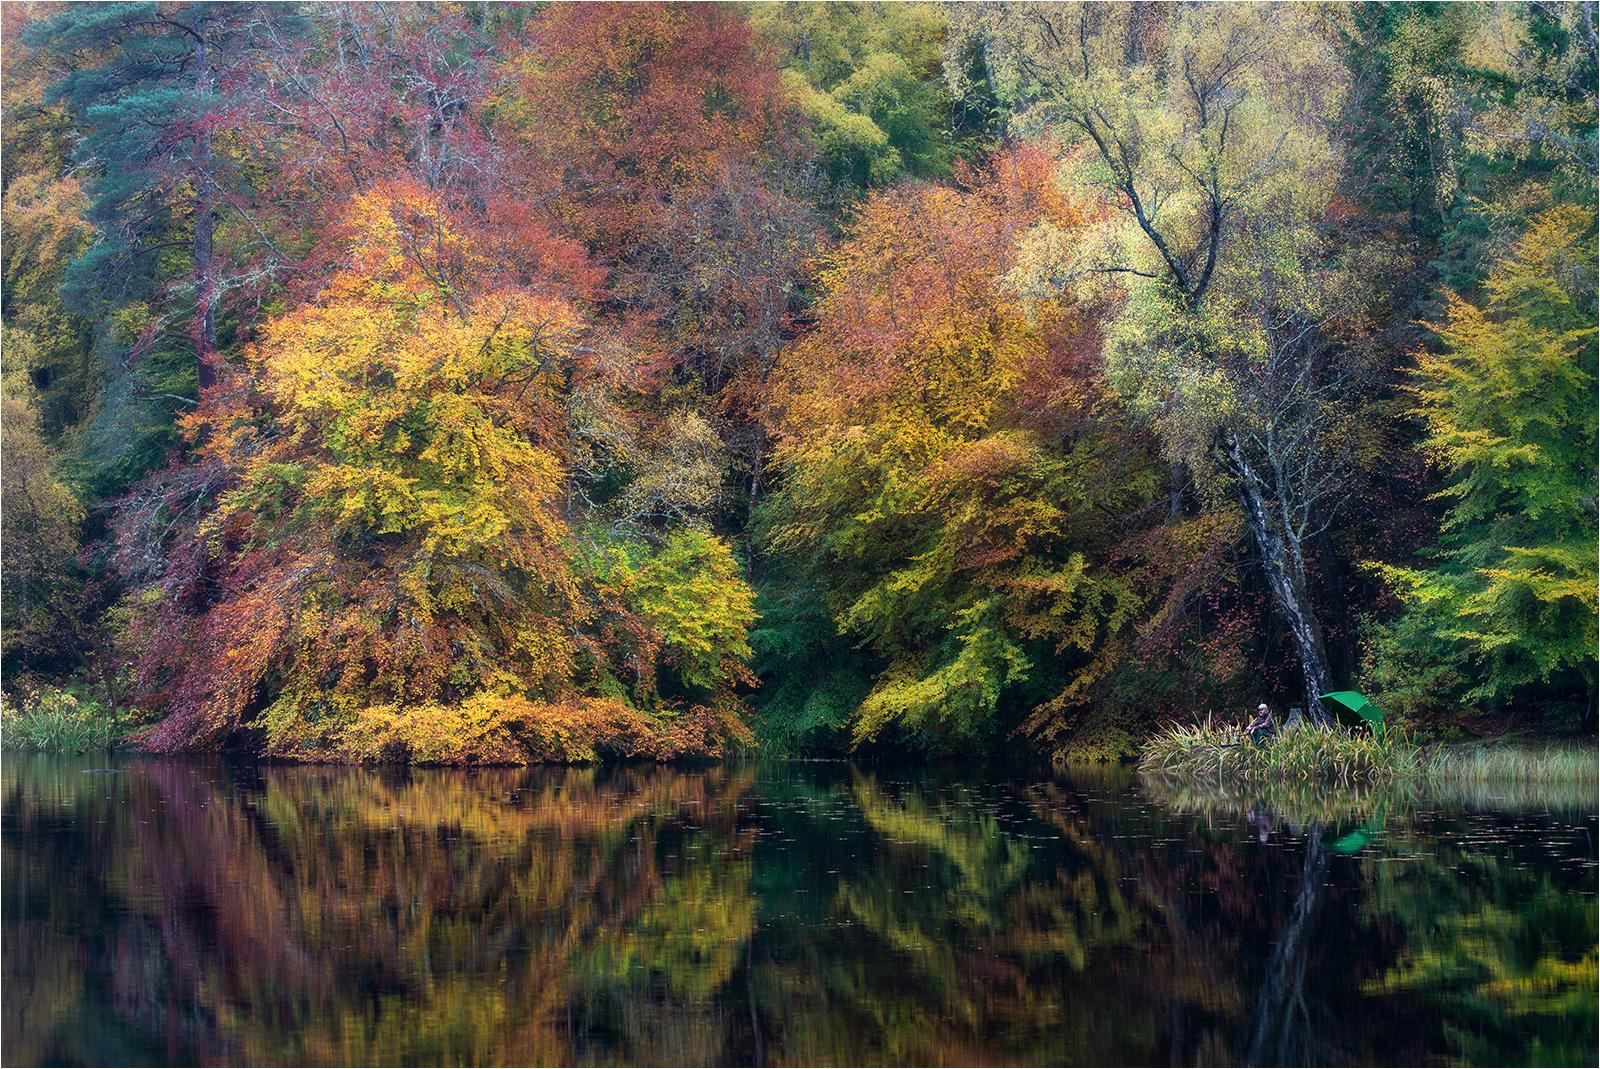 Autumnal-fisherman_149pnt.